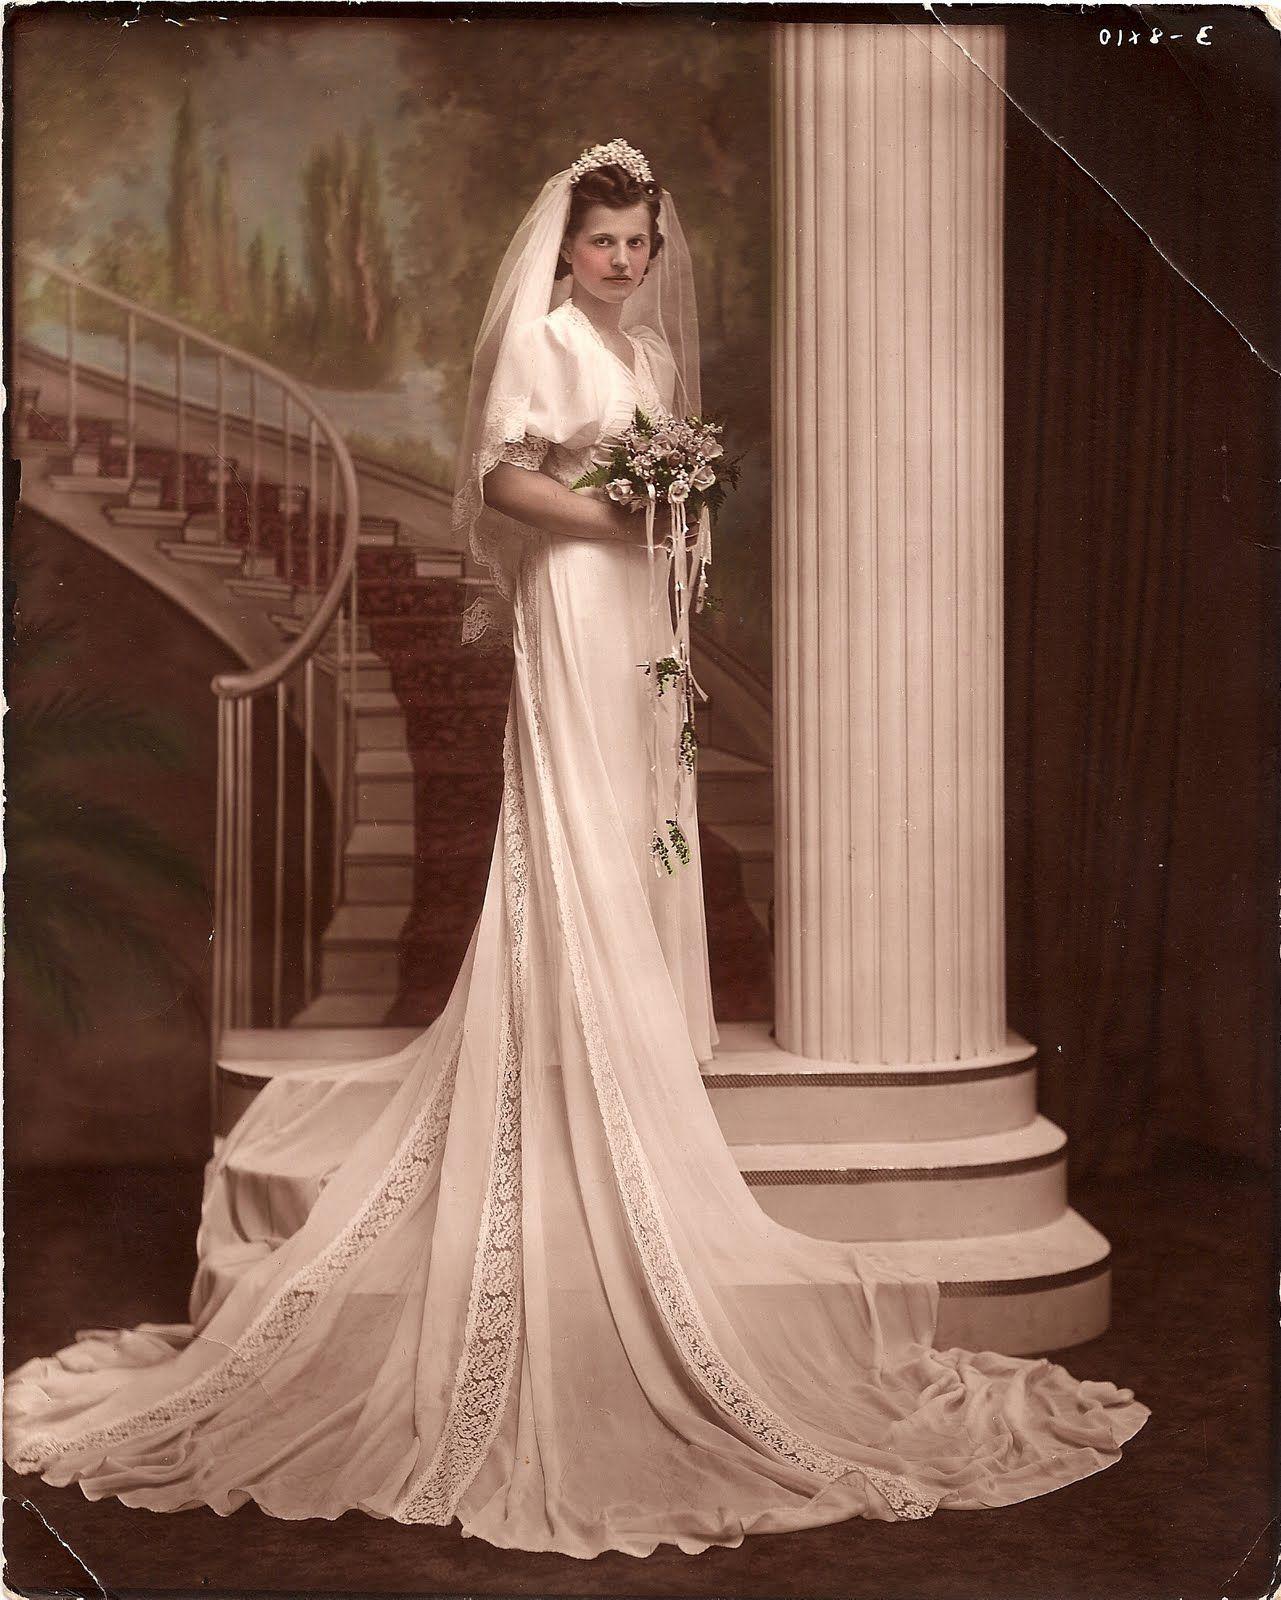 Vintage Wedding Dresses Perth: Vintage Wedding Attire